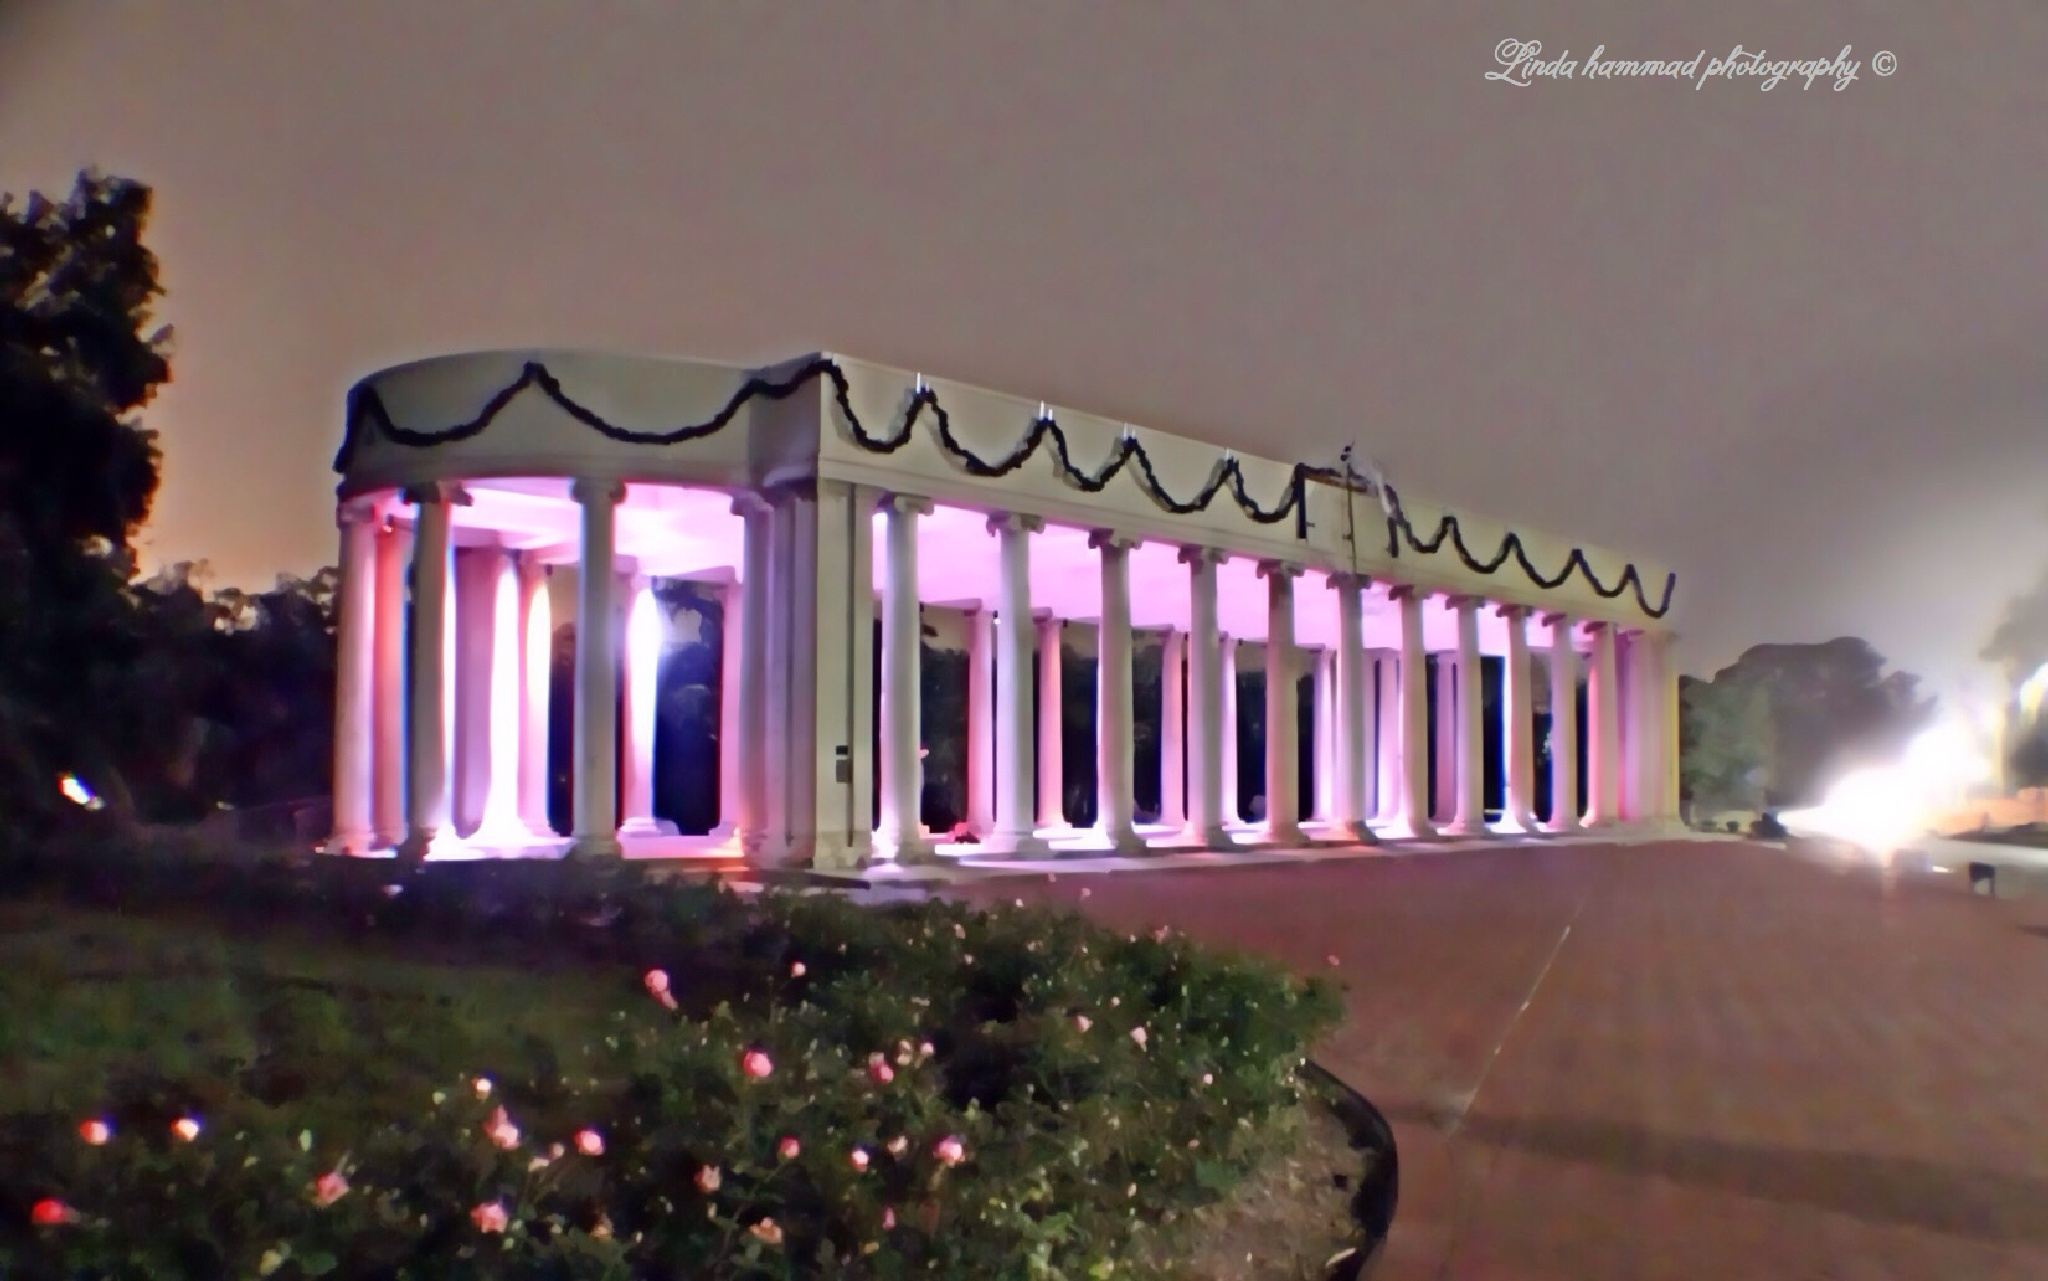 N.O. City park  by Linda Hammad